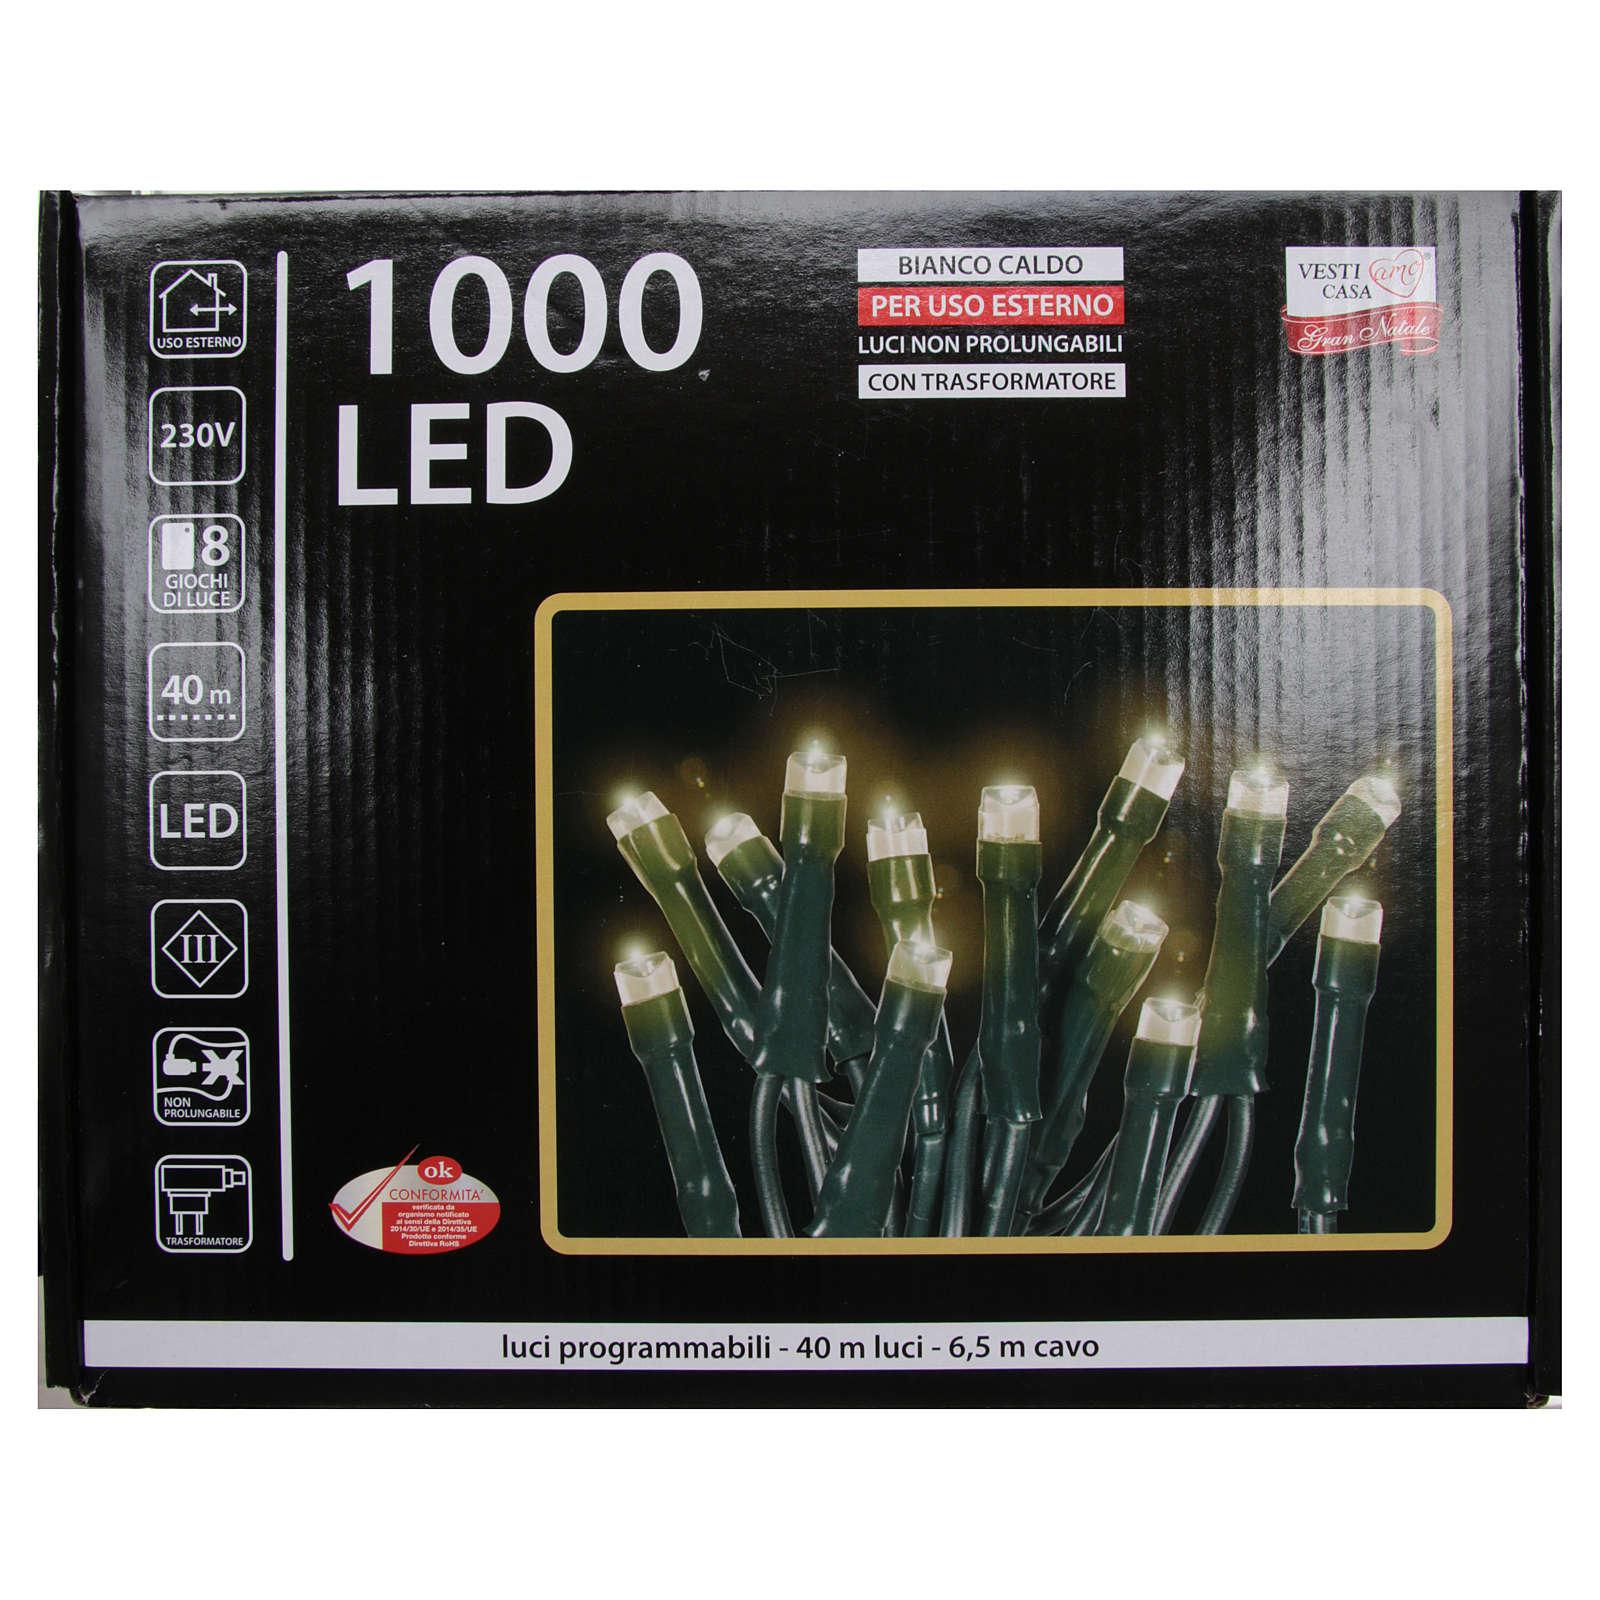 Luce Natale catena 1000 LED bianco caldo ESTERNO programmabili 3